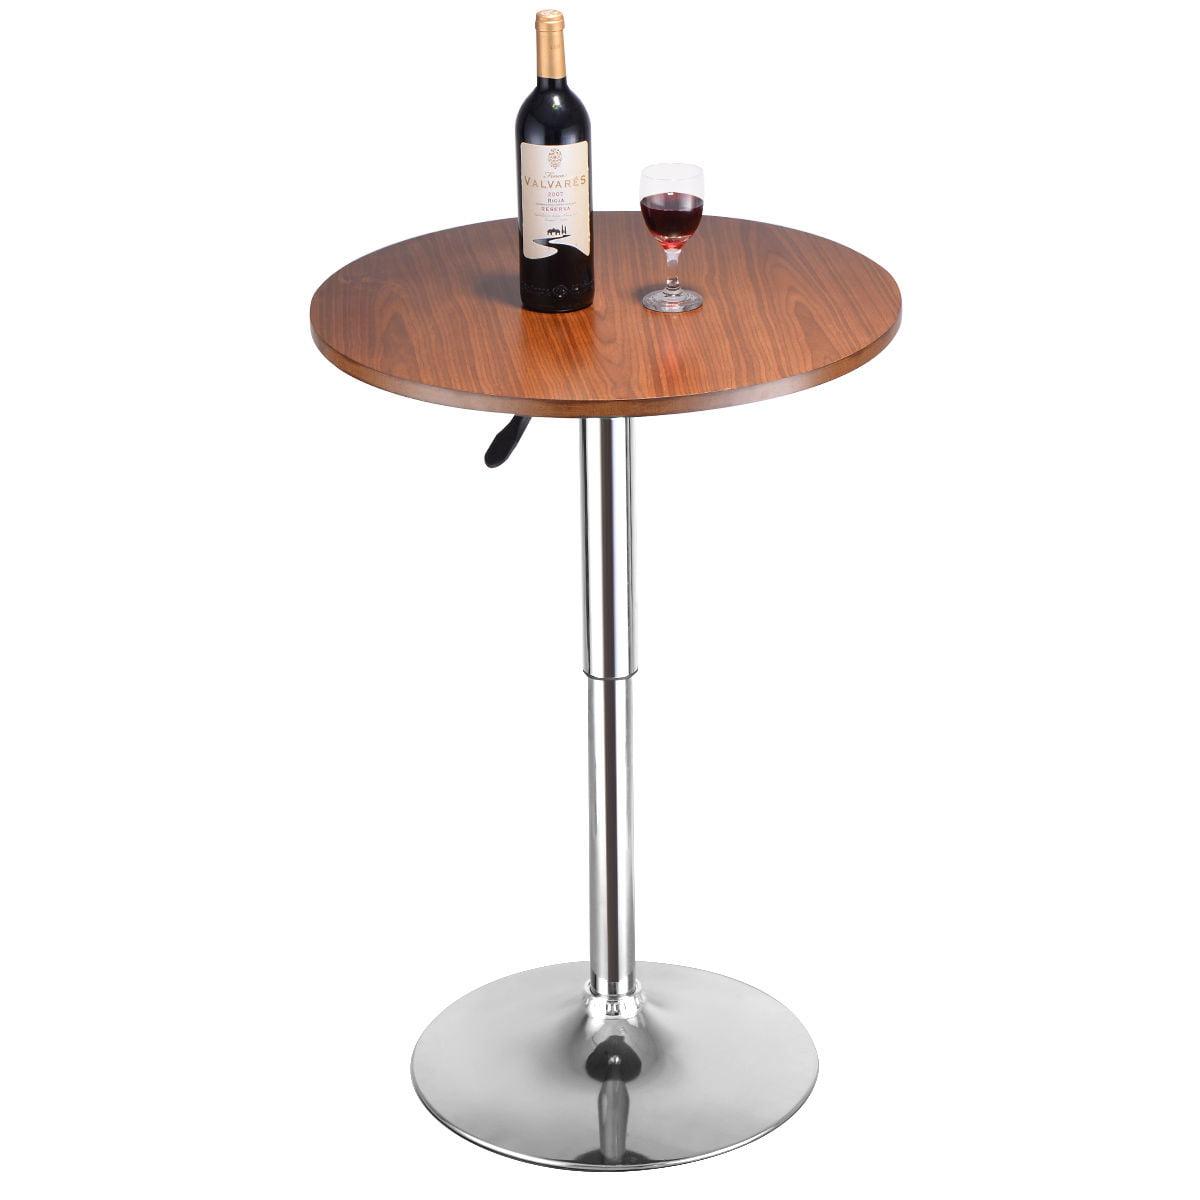 Costway Modern Round Bar Table Adjustable Bistro Pub Coun...